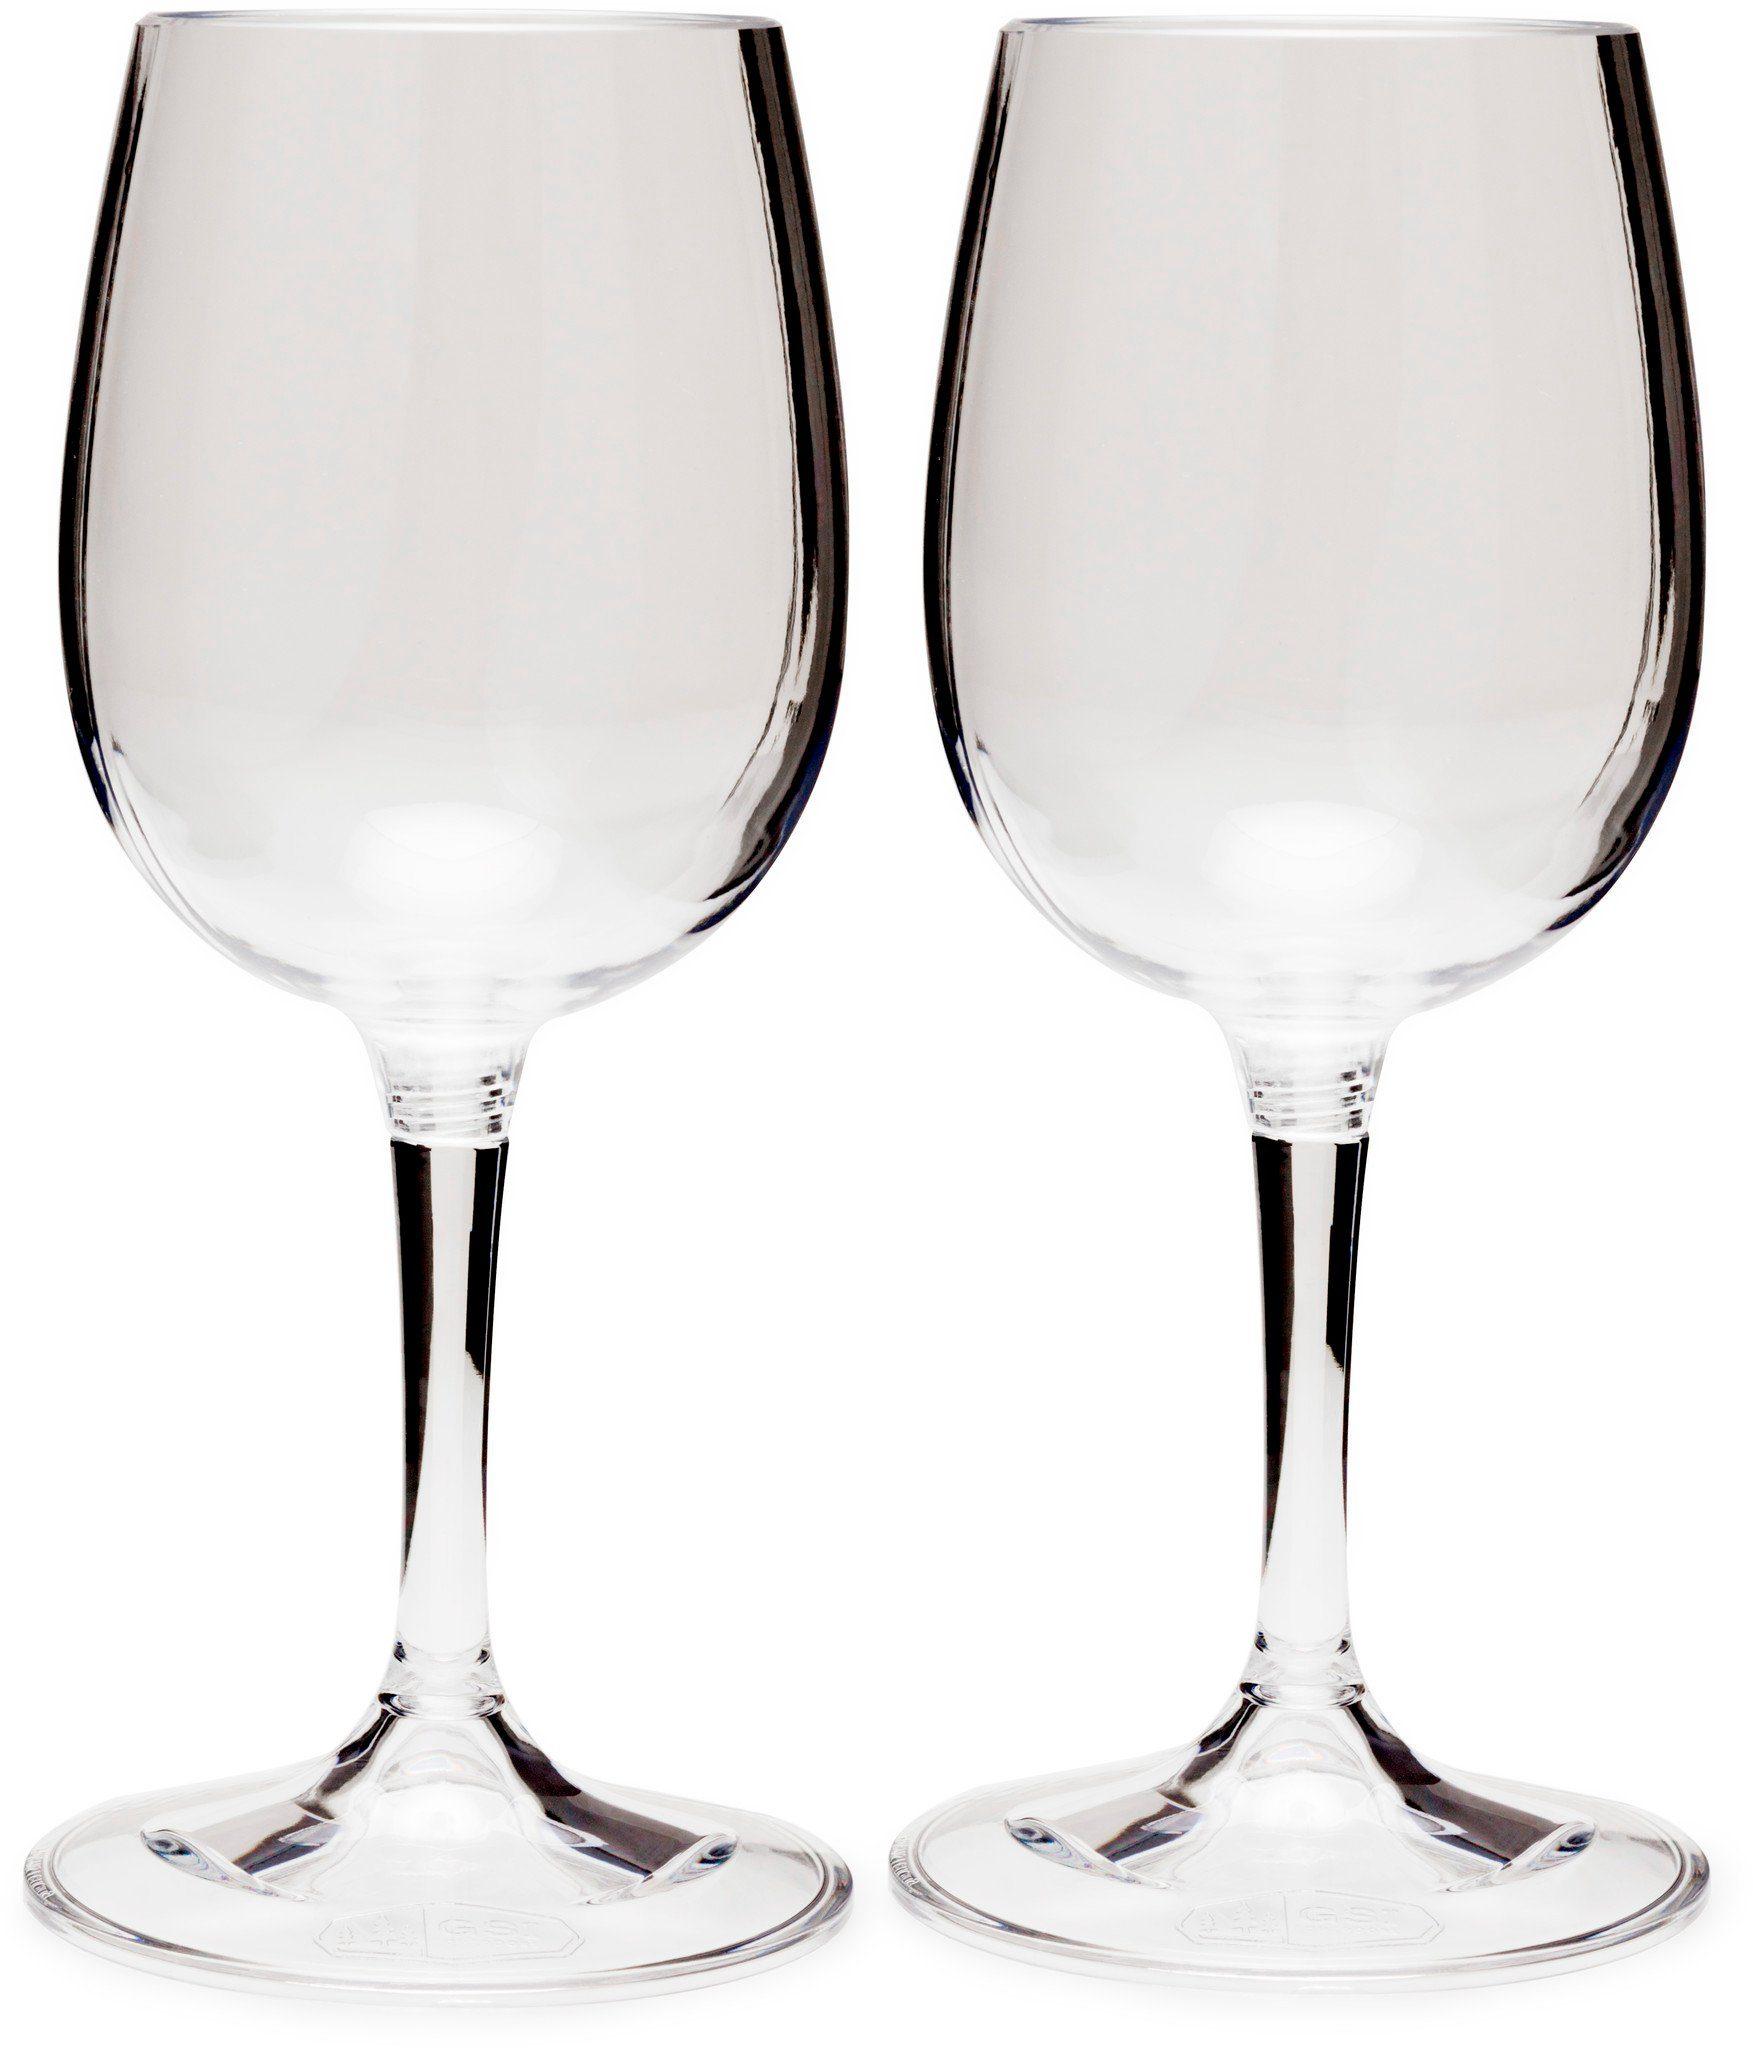 GSI Trinkflasche »Nesting Wine Glass Set«